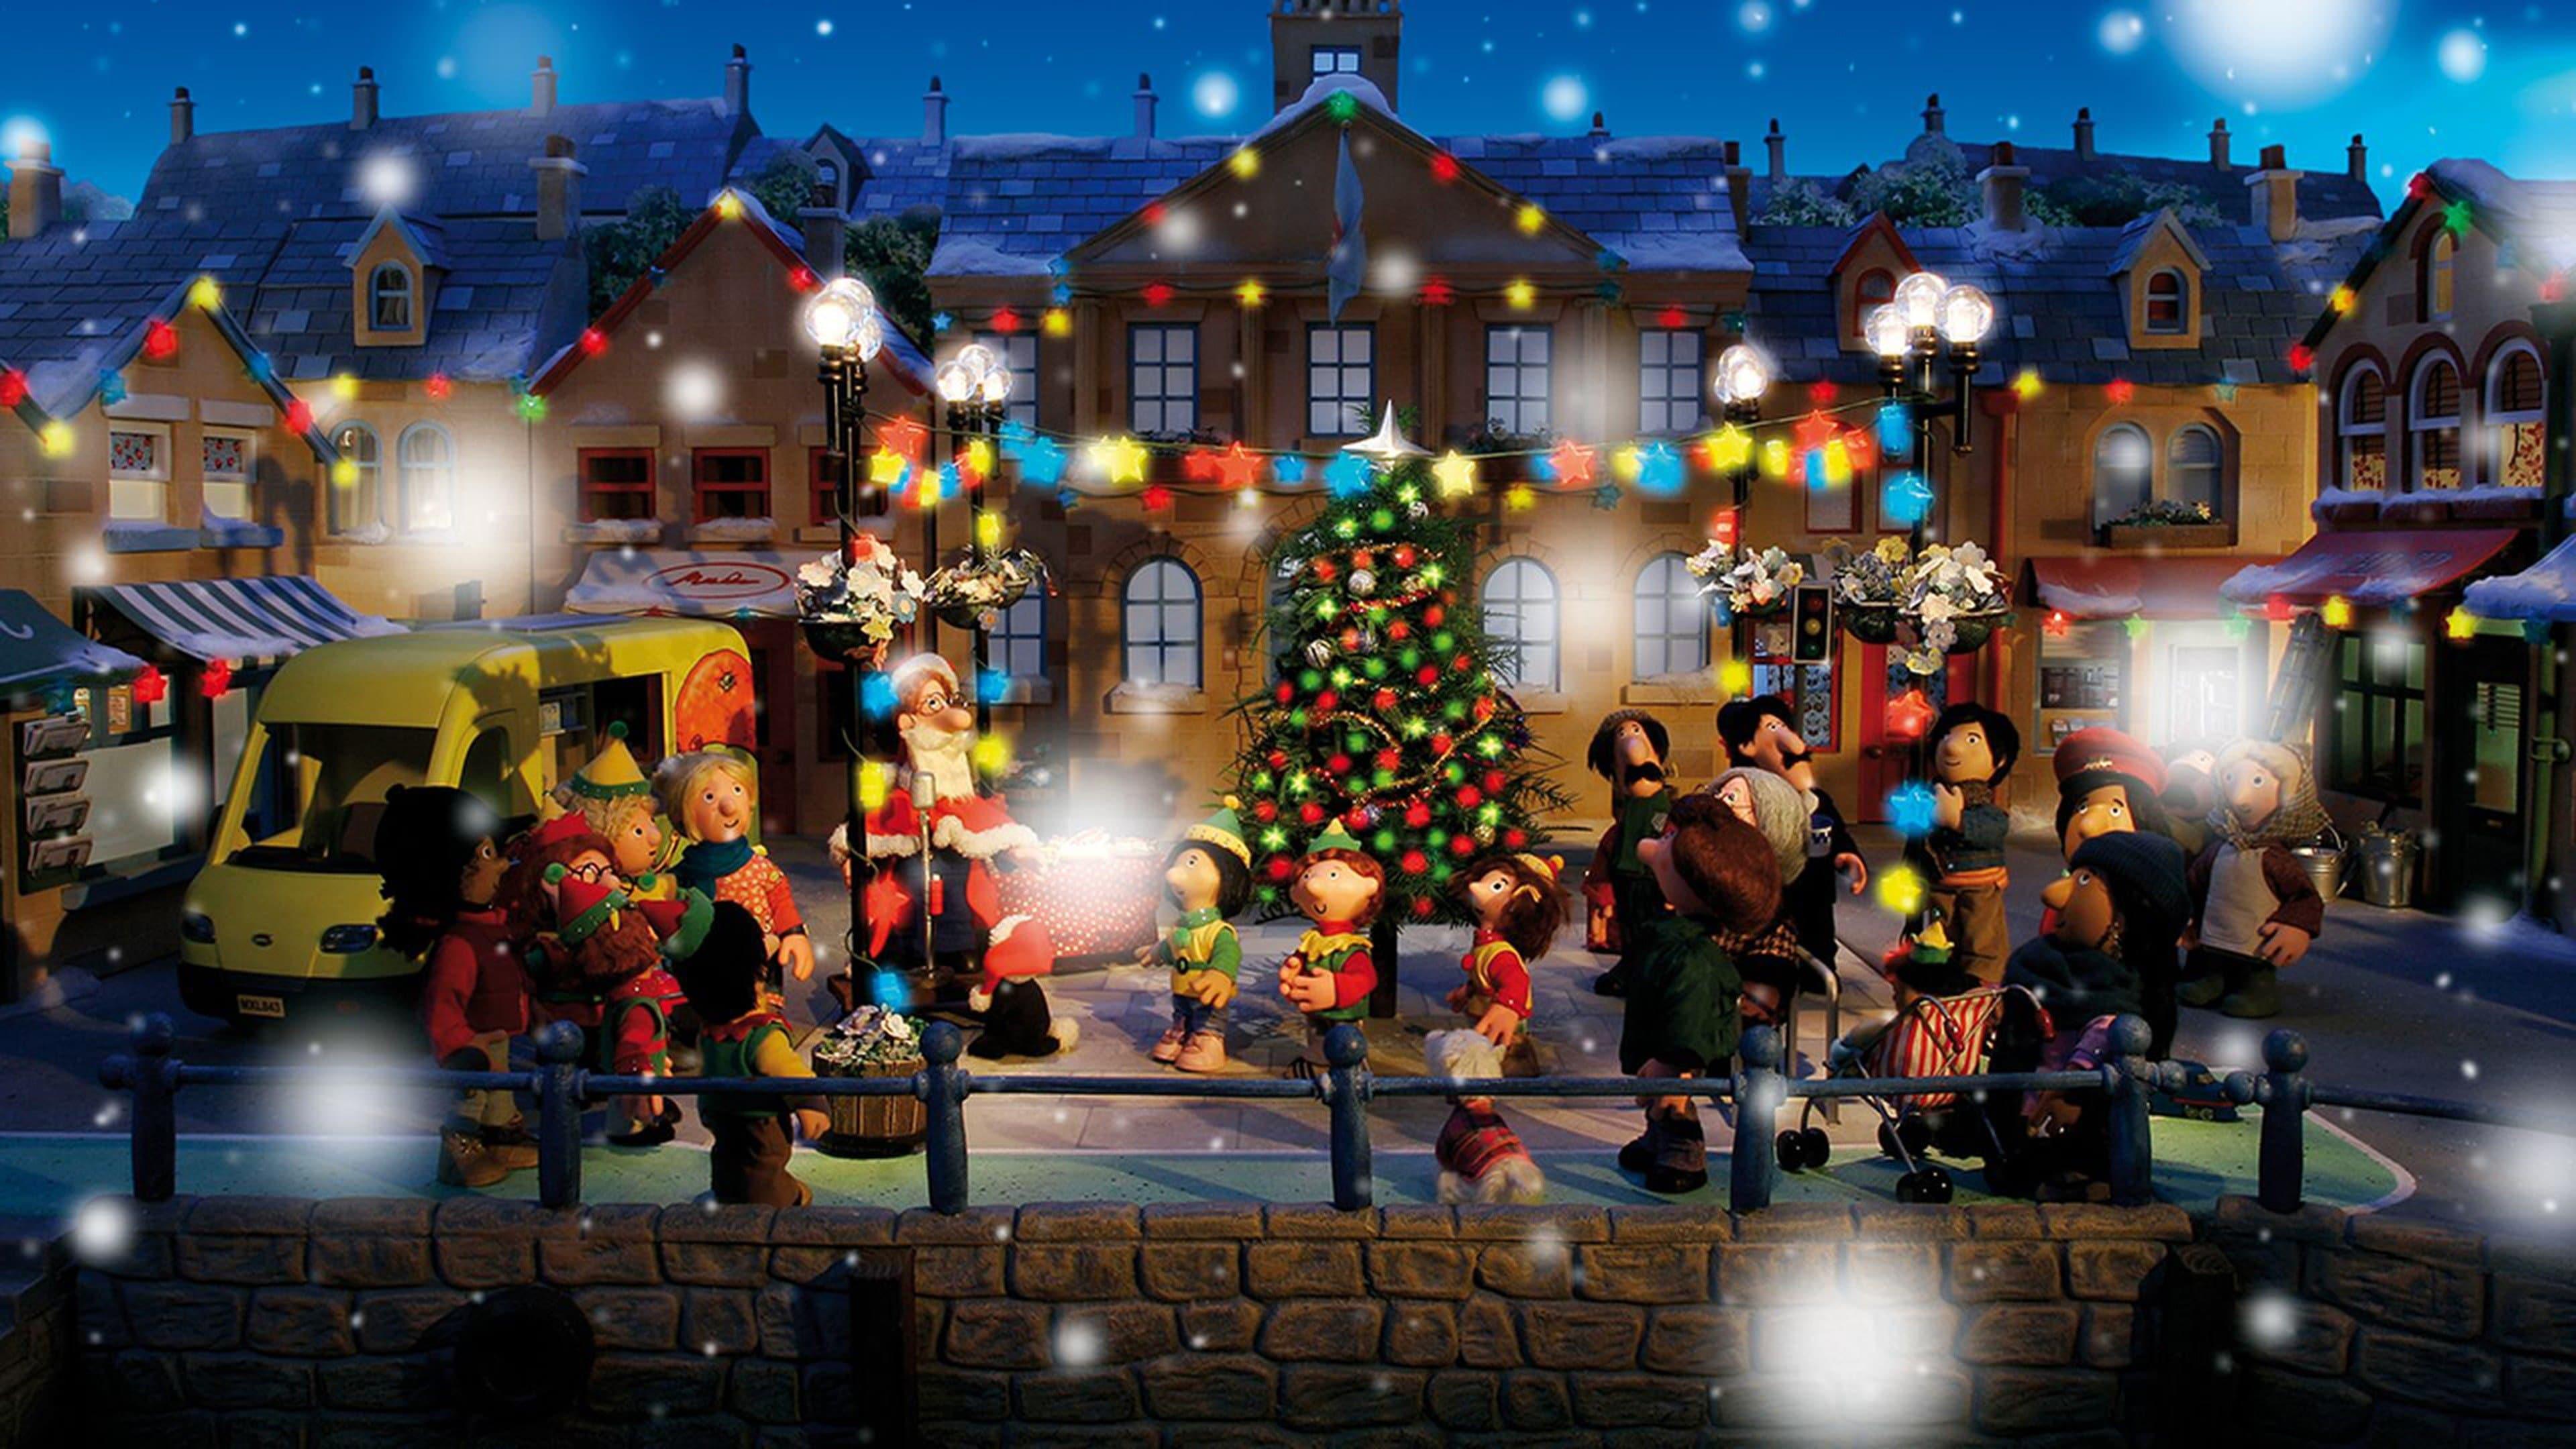 The Flying Christmas Stocking